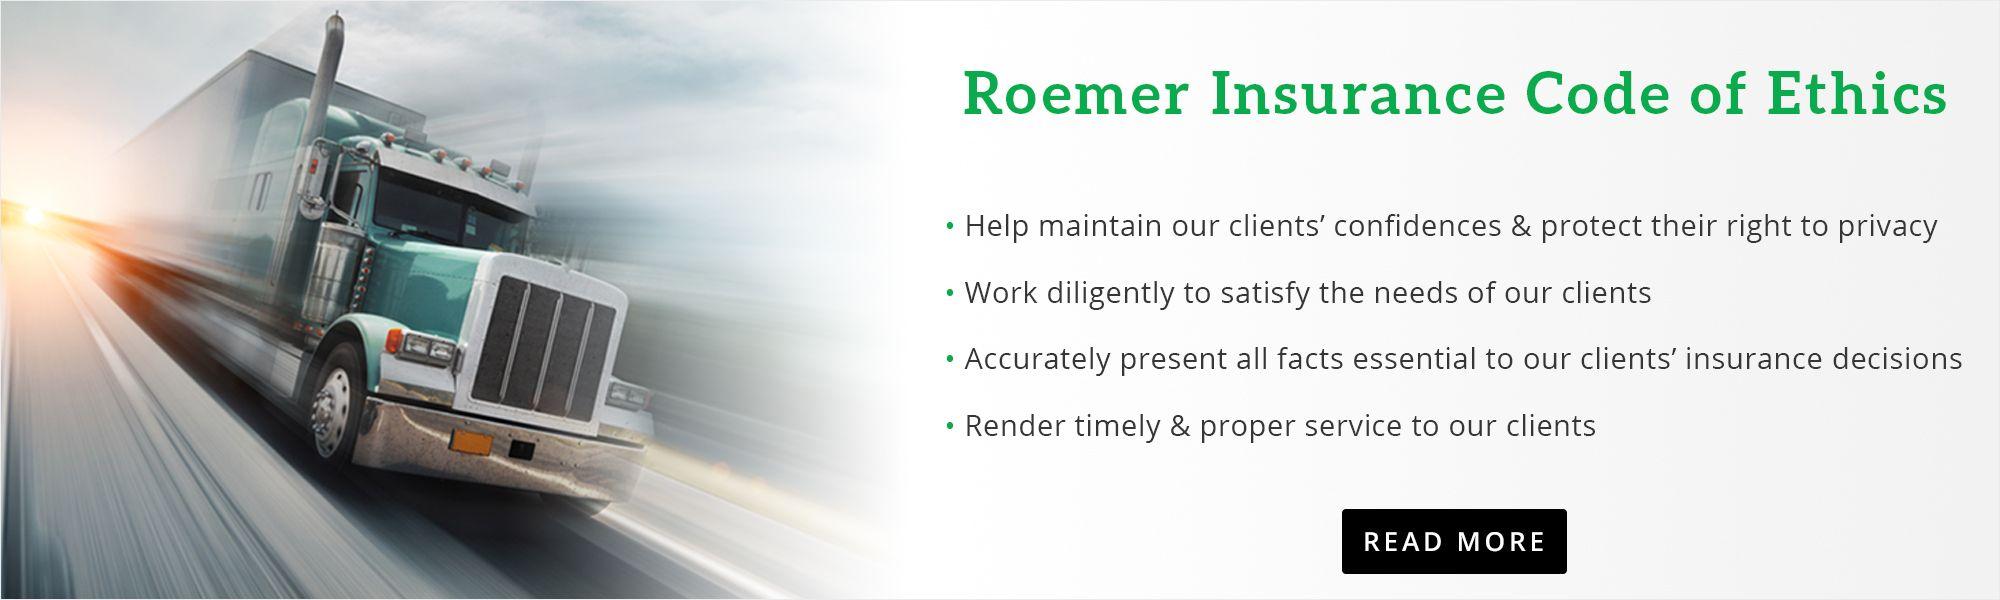 Roemer Insurance Code of Ethics